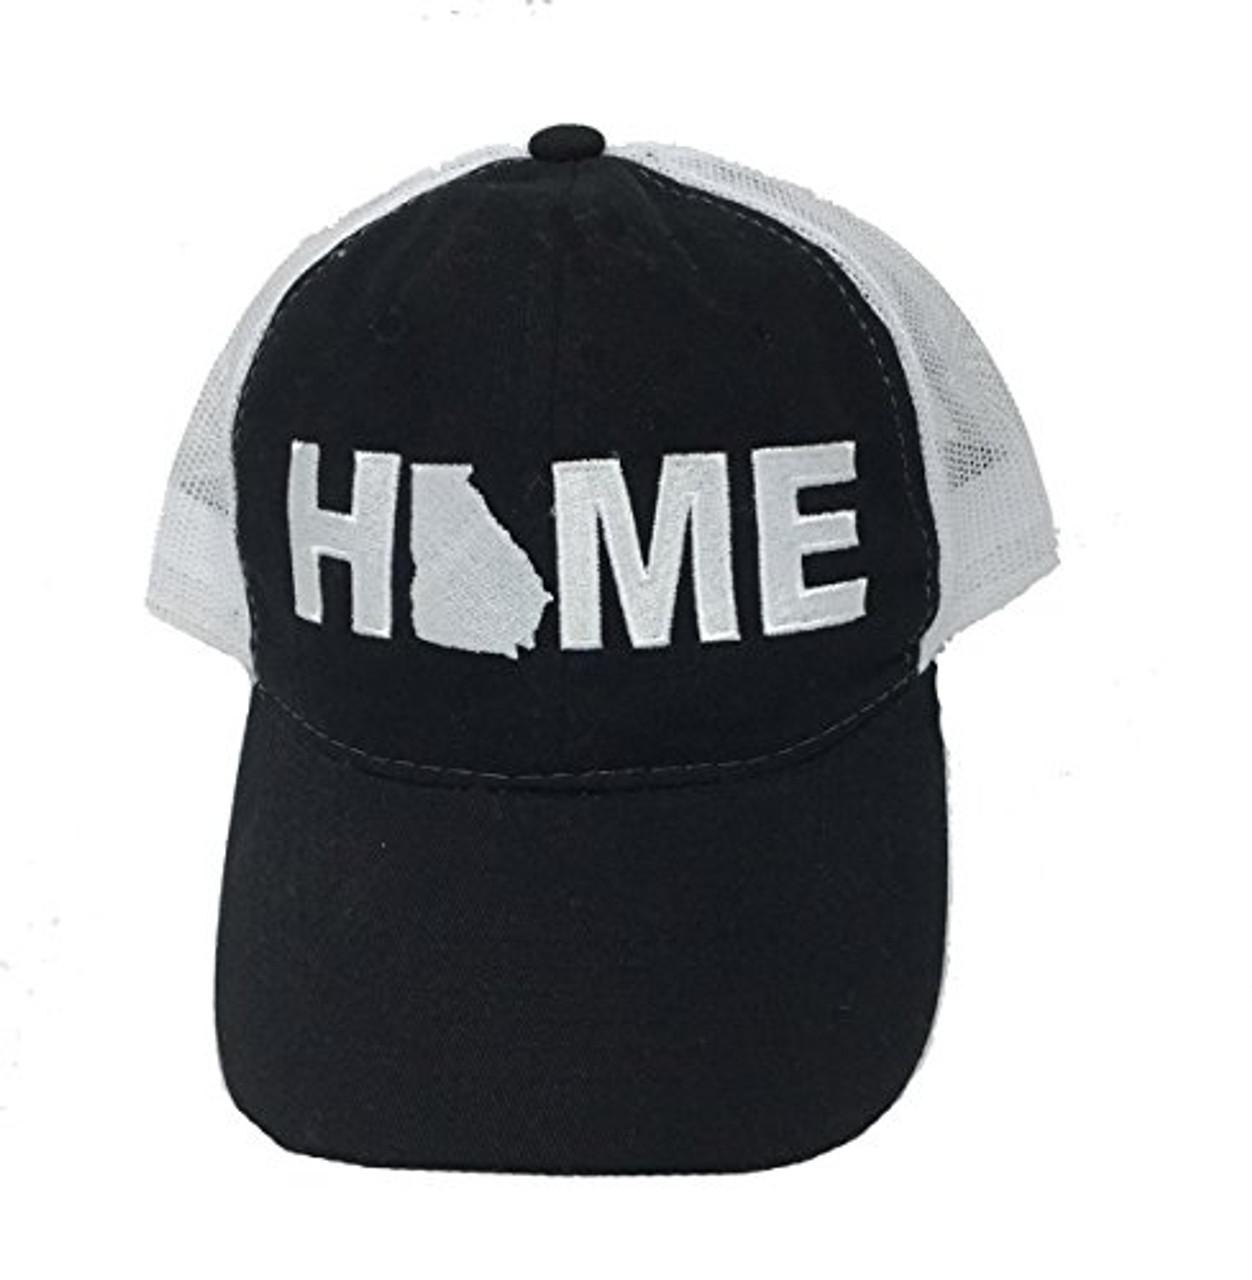 8f008e25489 Heritage Pride Georgia Home Mesh Trucker Hat - Trenz Shirt Company